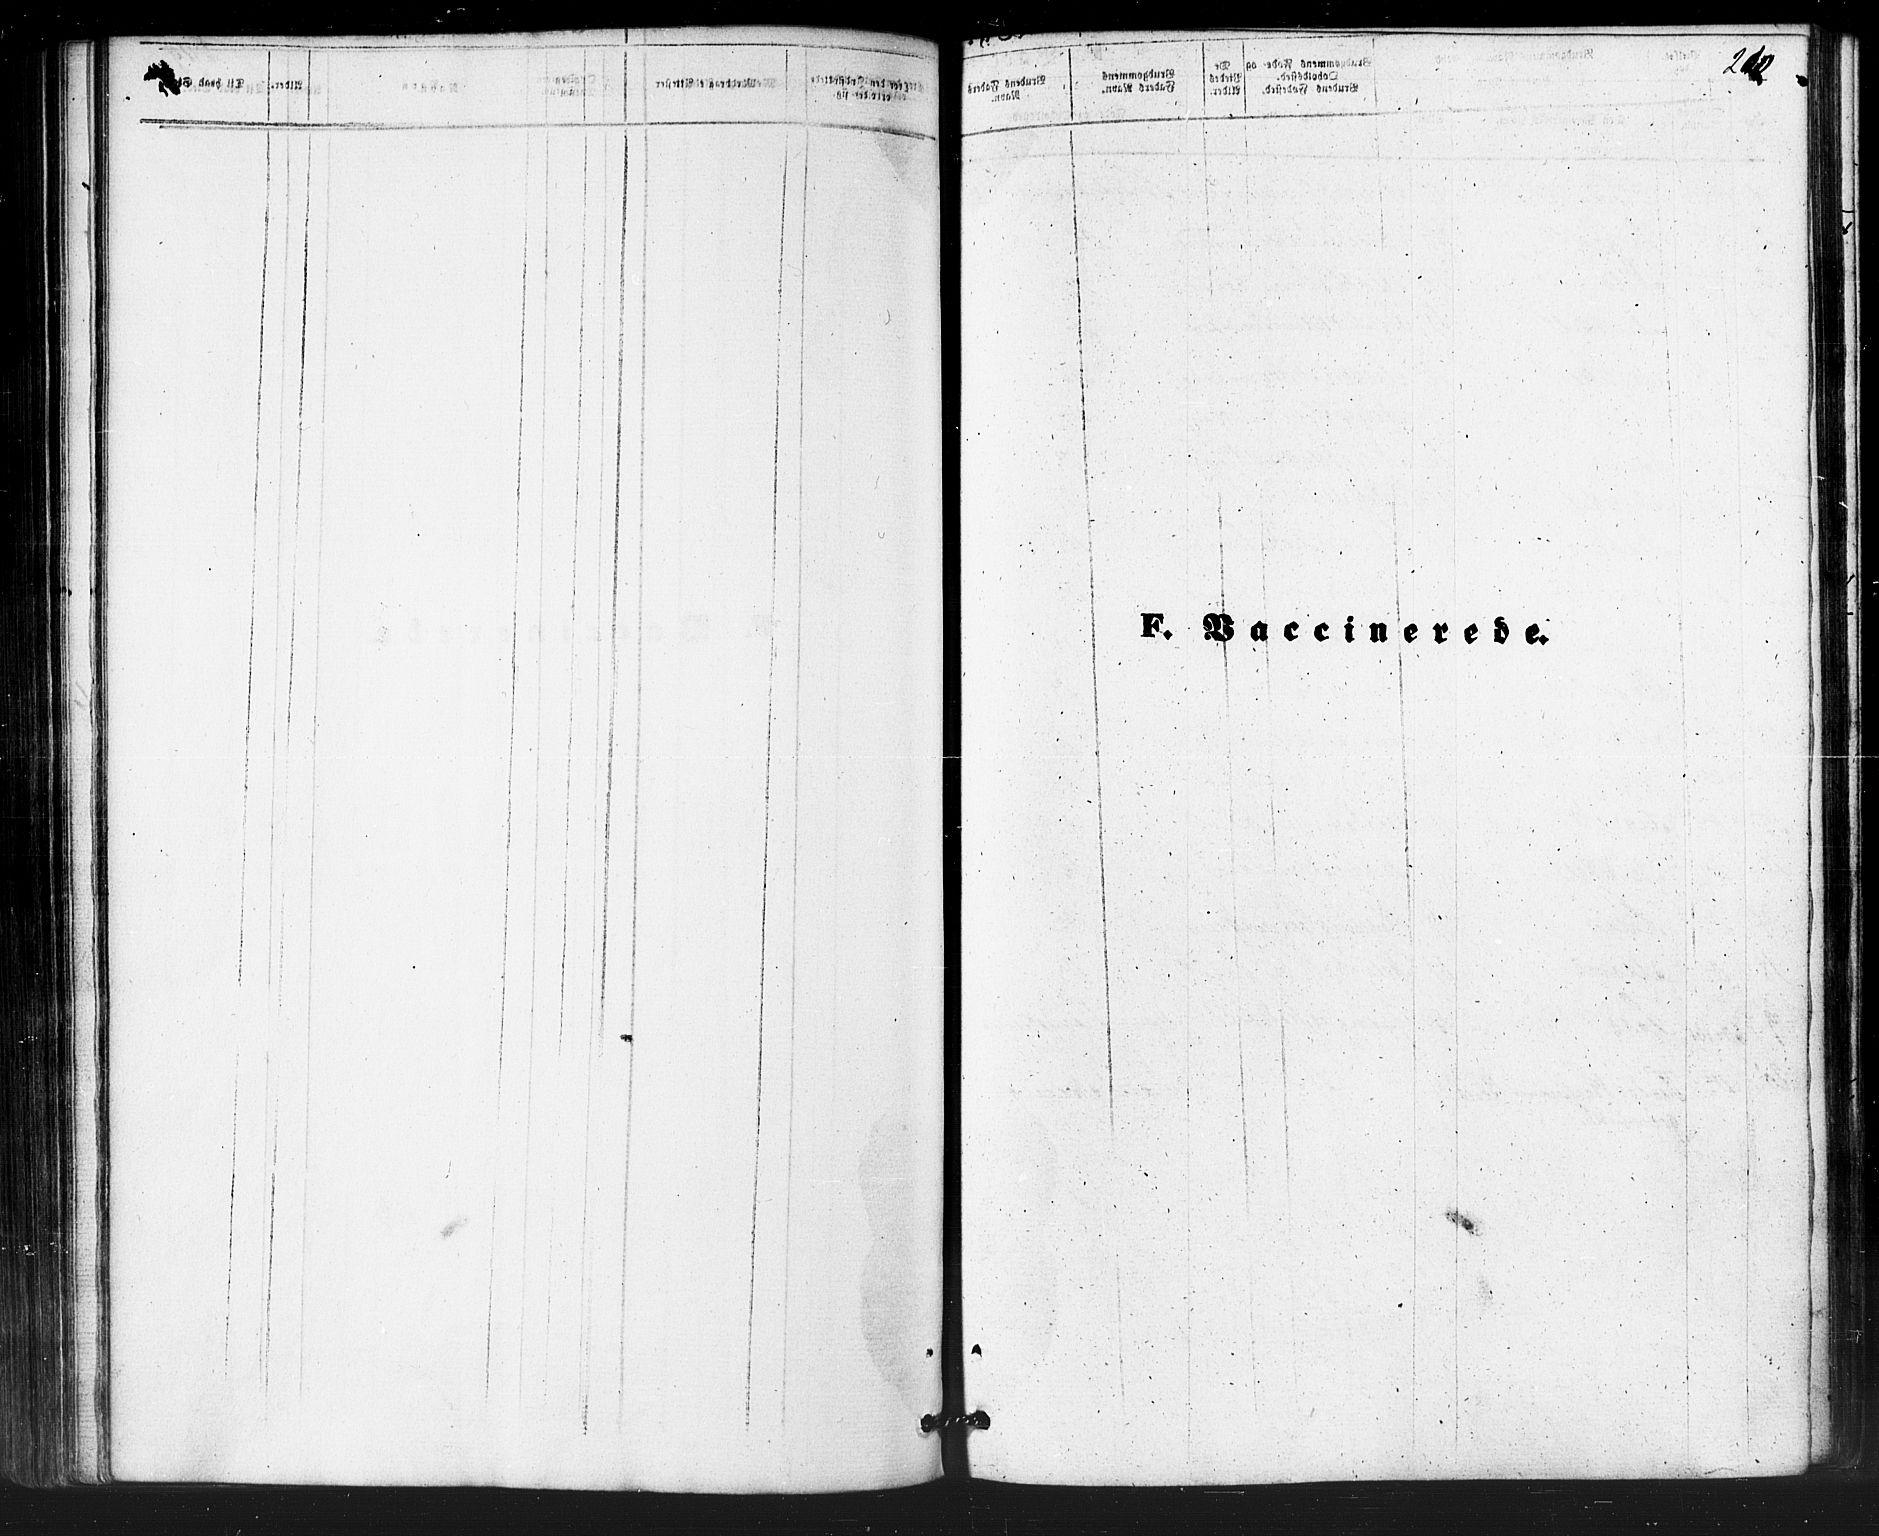 SATØ, Kautokeino sokneprestembete, H/Ha/L0003.kirke: Ministerialbok nr. 3, 1862-1879, s. 210